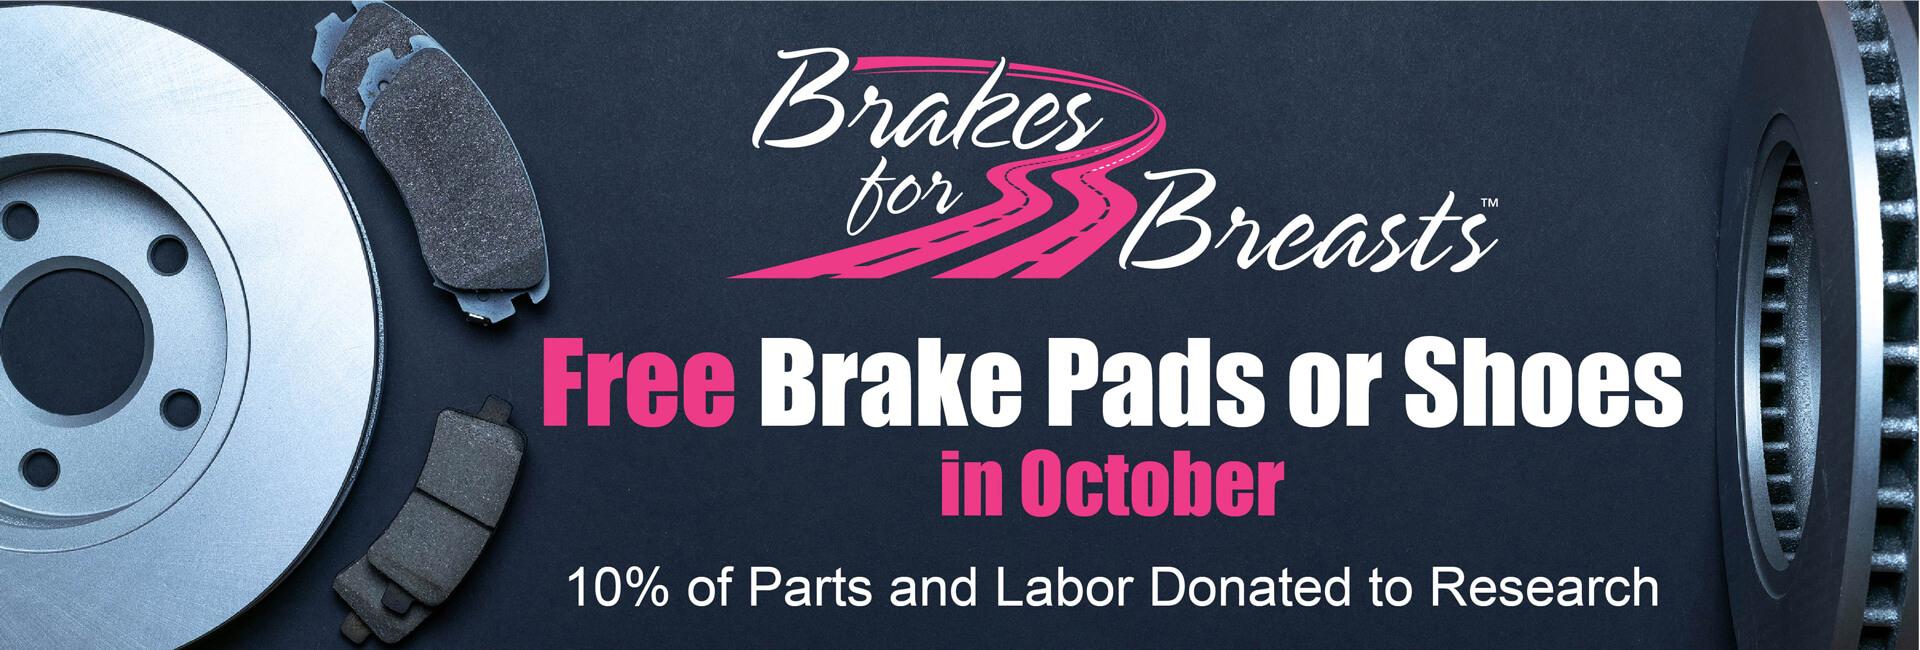 asap auto repair brakes for breasts